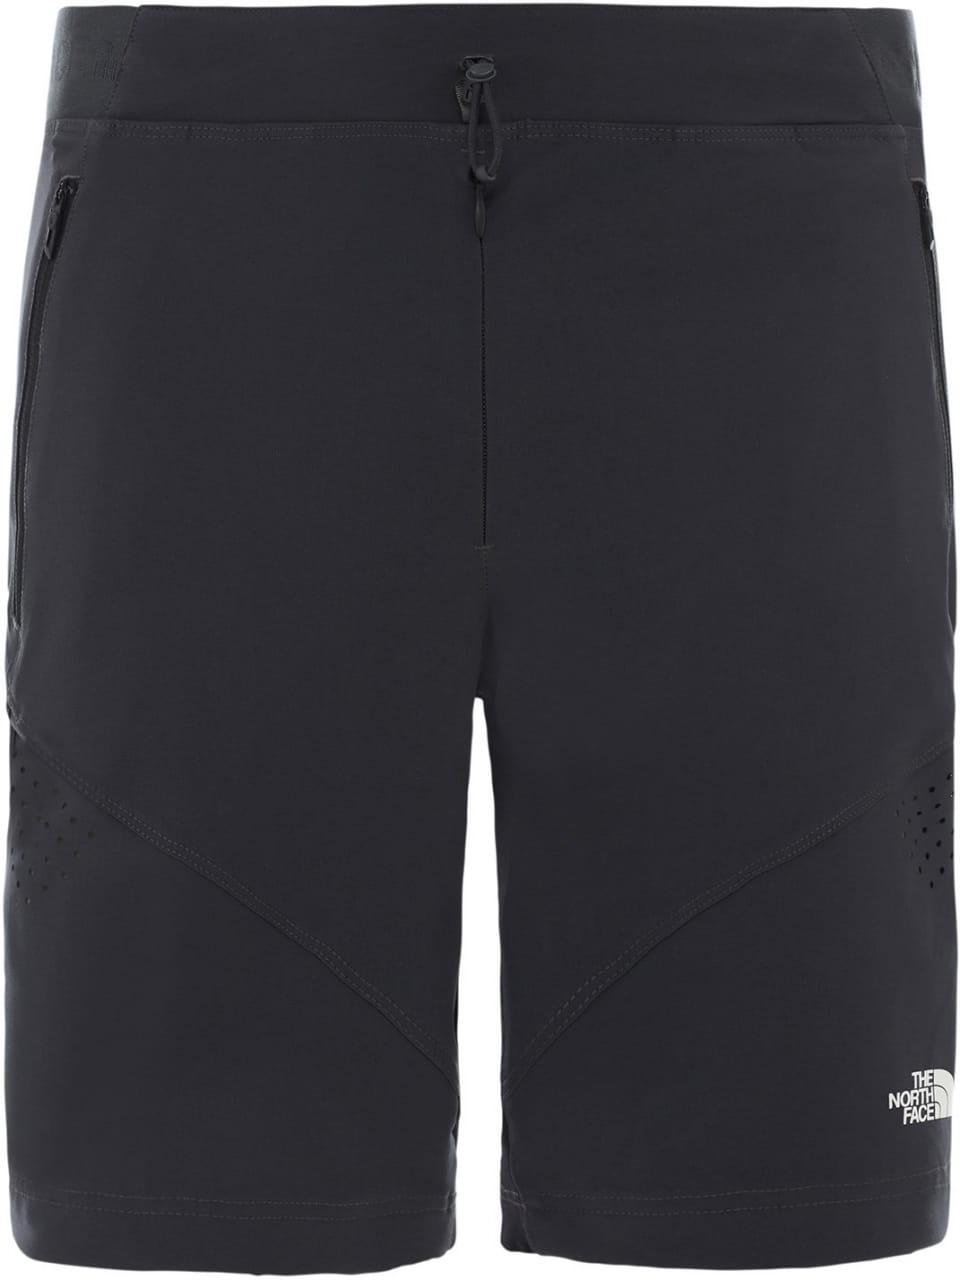 Shorts The North Face Men's Impendor Alpine Shorts